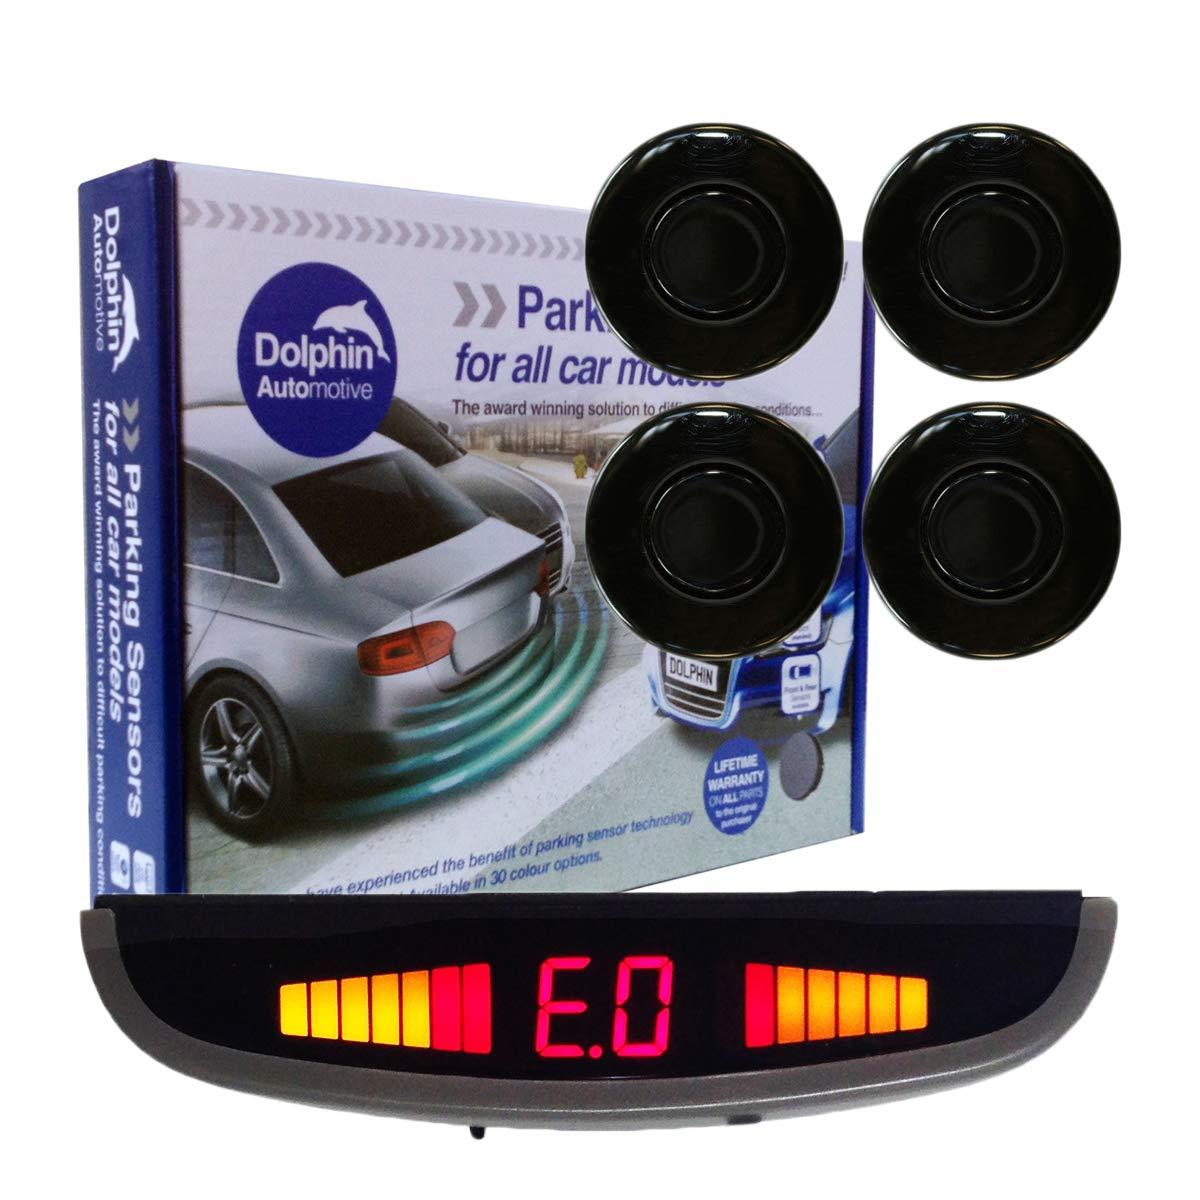 Dolphin DPS455 Reverse Parking Sensors In 32 Colours 4 Ultrasonic Radar Sensors Kit Audio /& Rear Roof Mounted Display Alert System Matt /& Gloss Black 30 More Colours Champagne